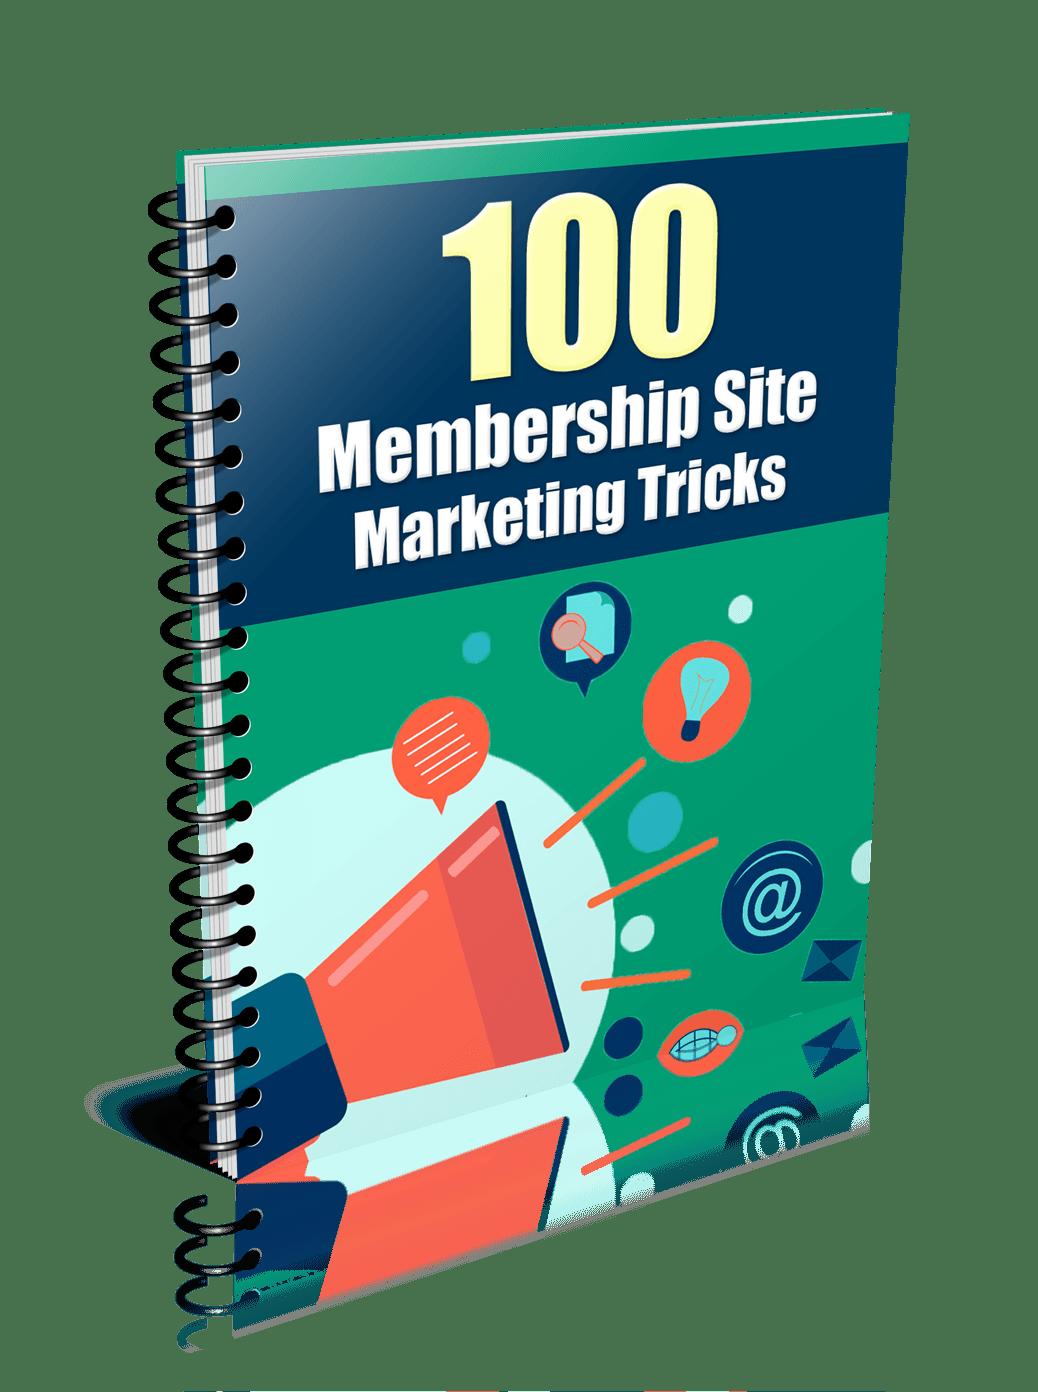 spiral report 100MembershipSiteMarketingTricks - How To Make Quick Money Online - Niche Membership Sites